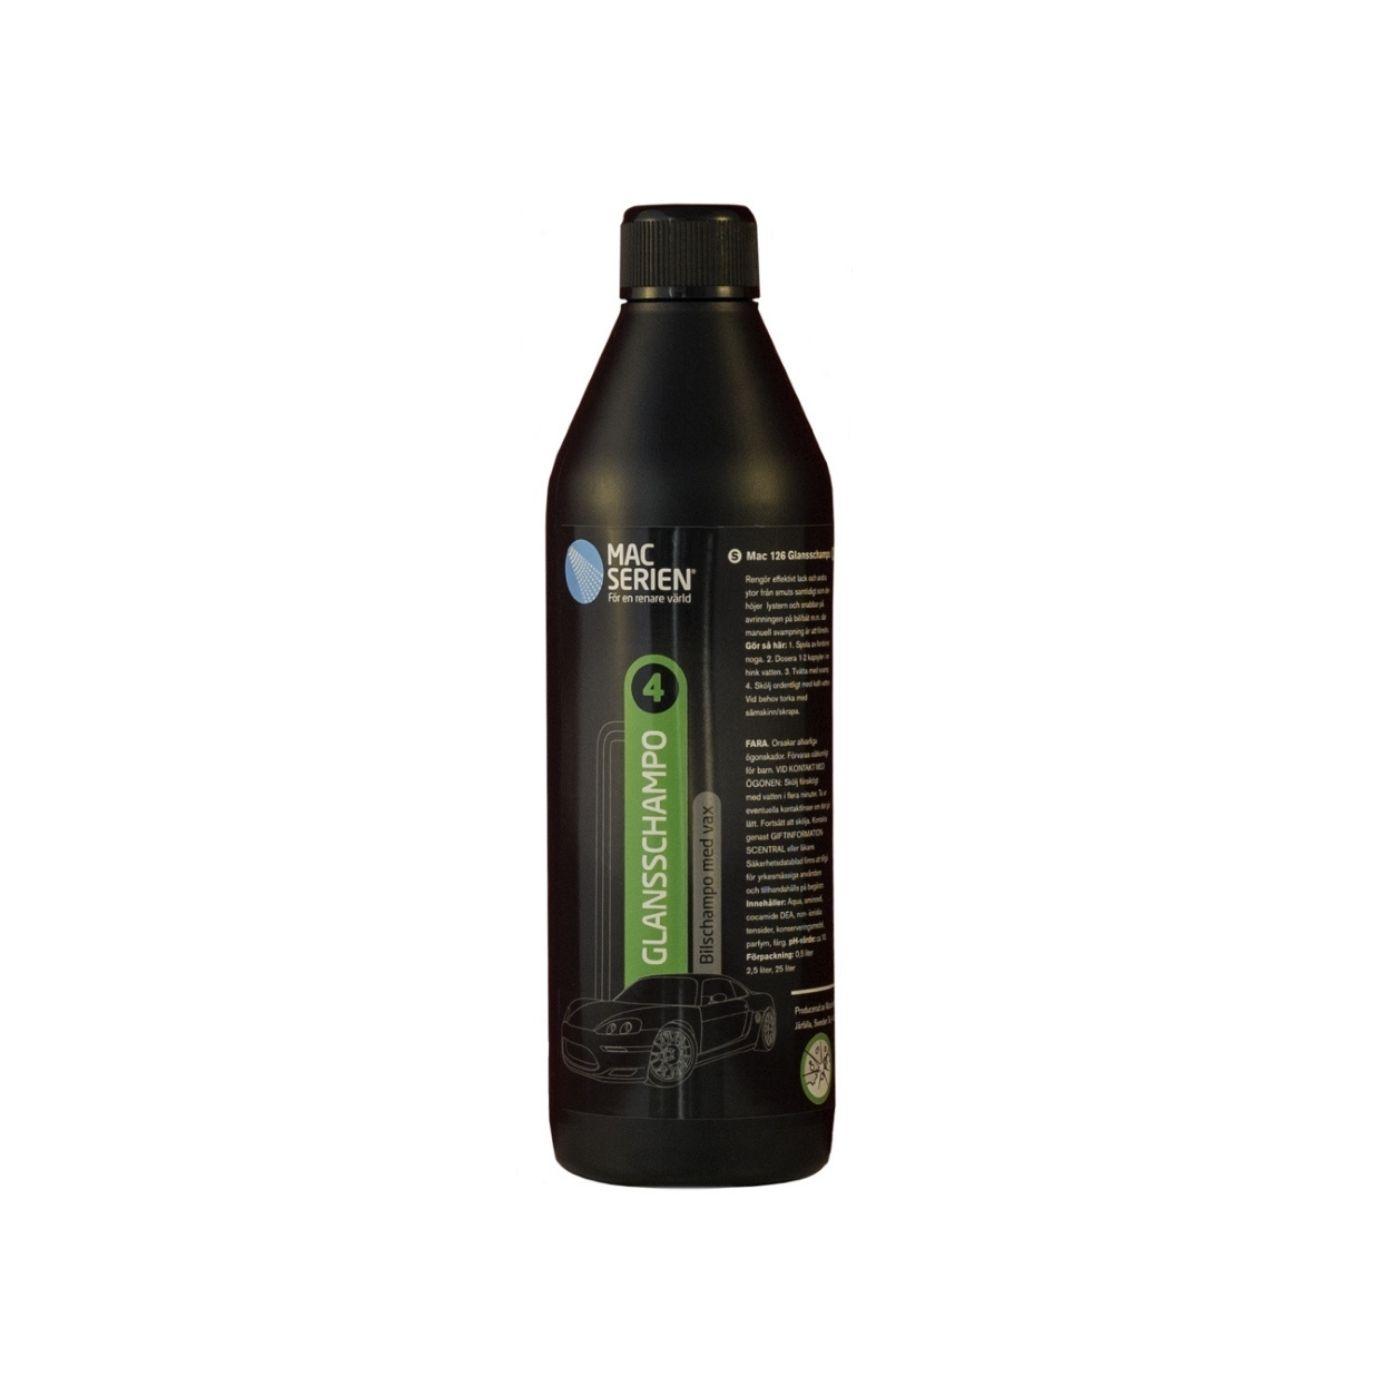 Bilschampo Mac 126 Glansschampo, 500 ml